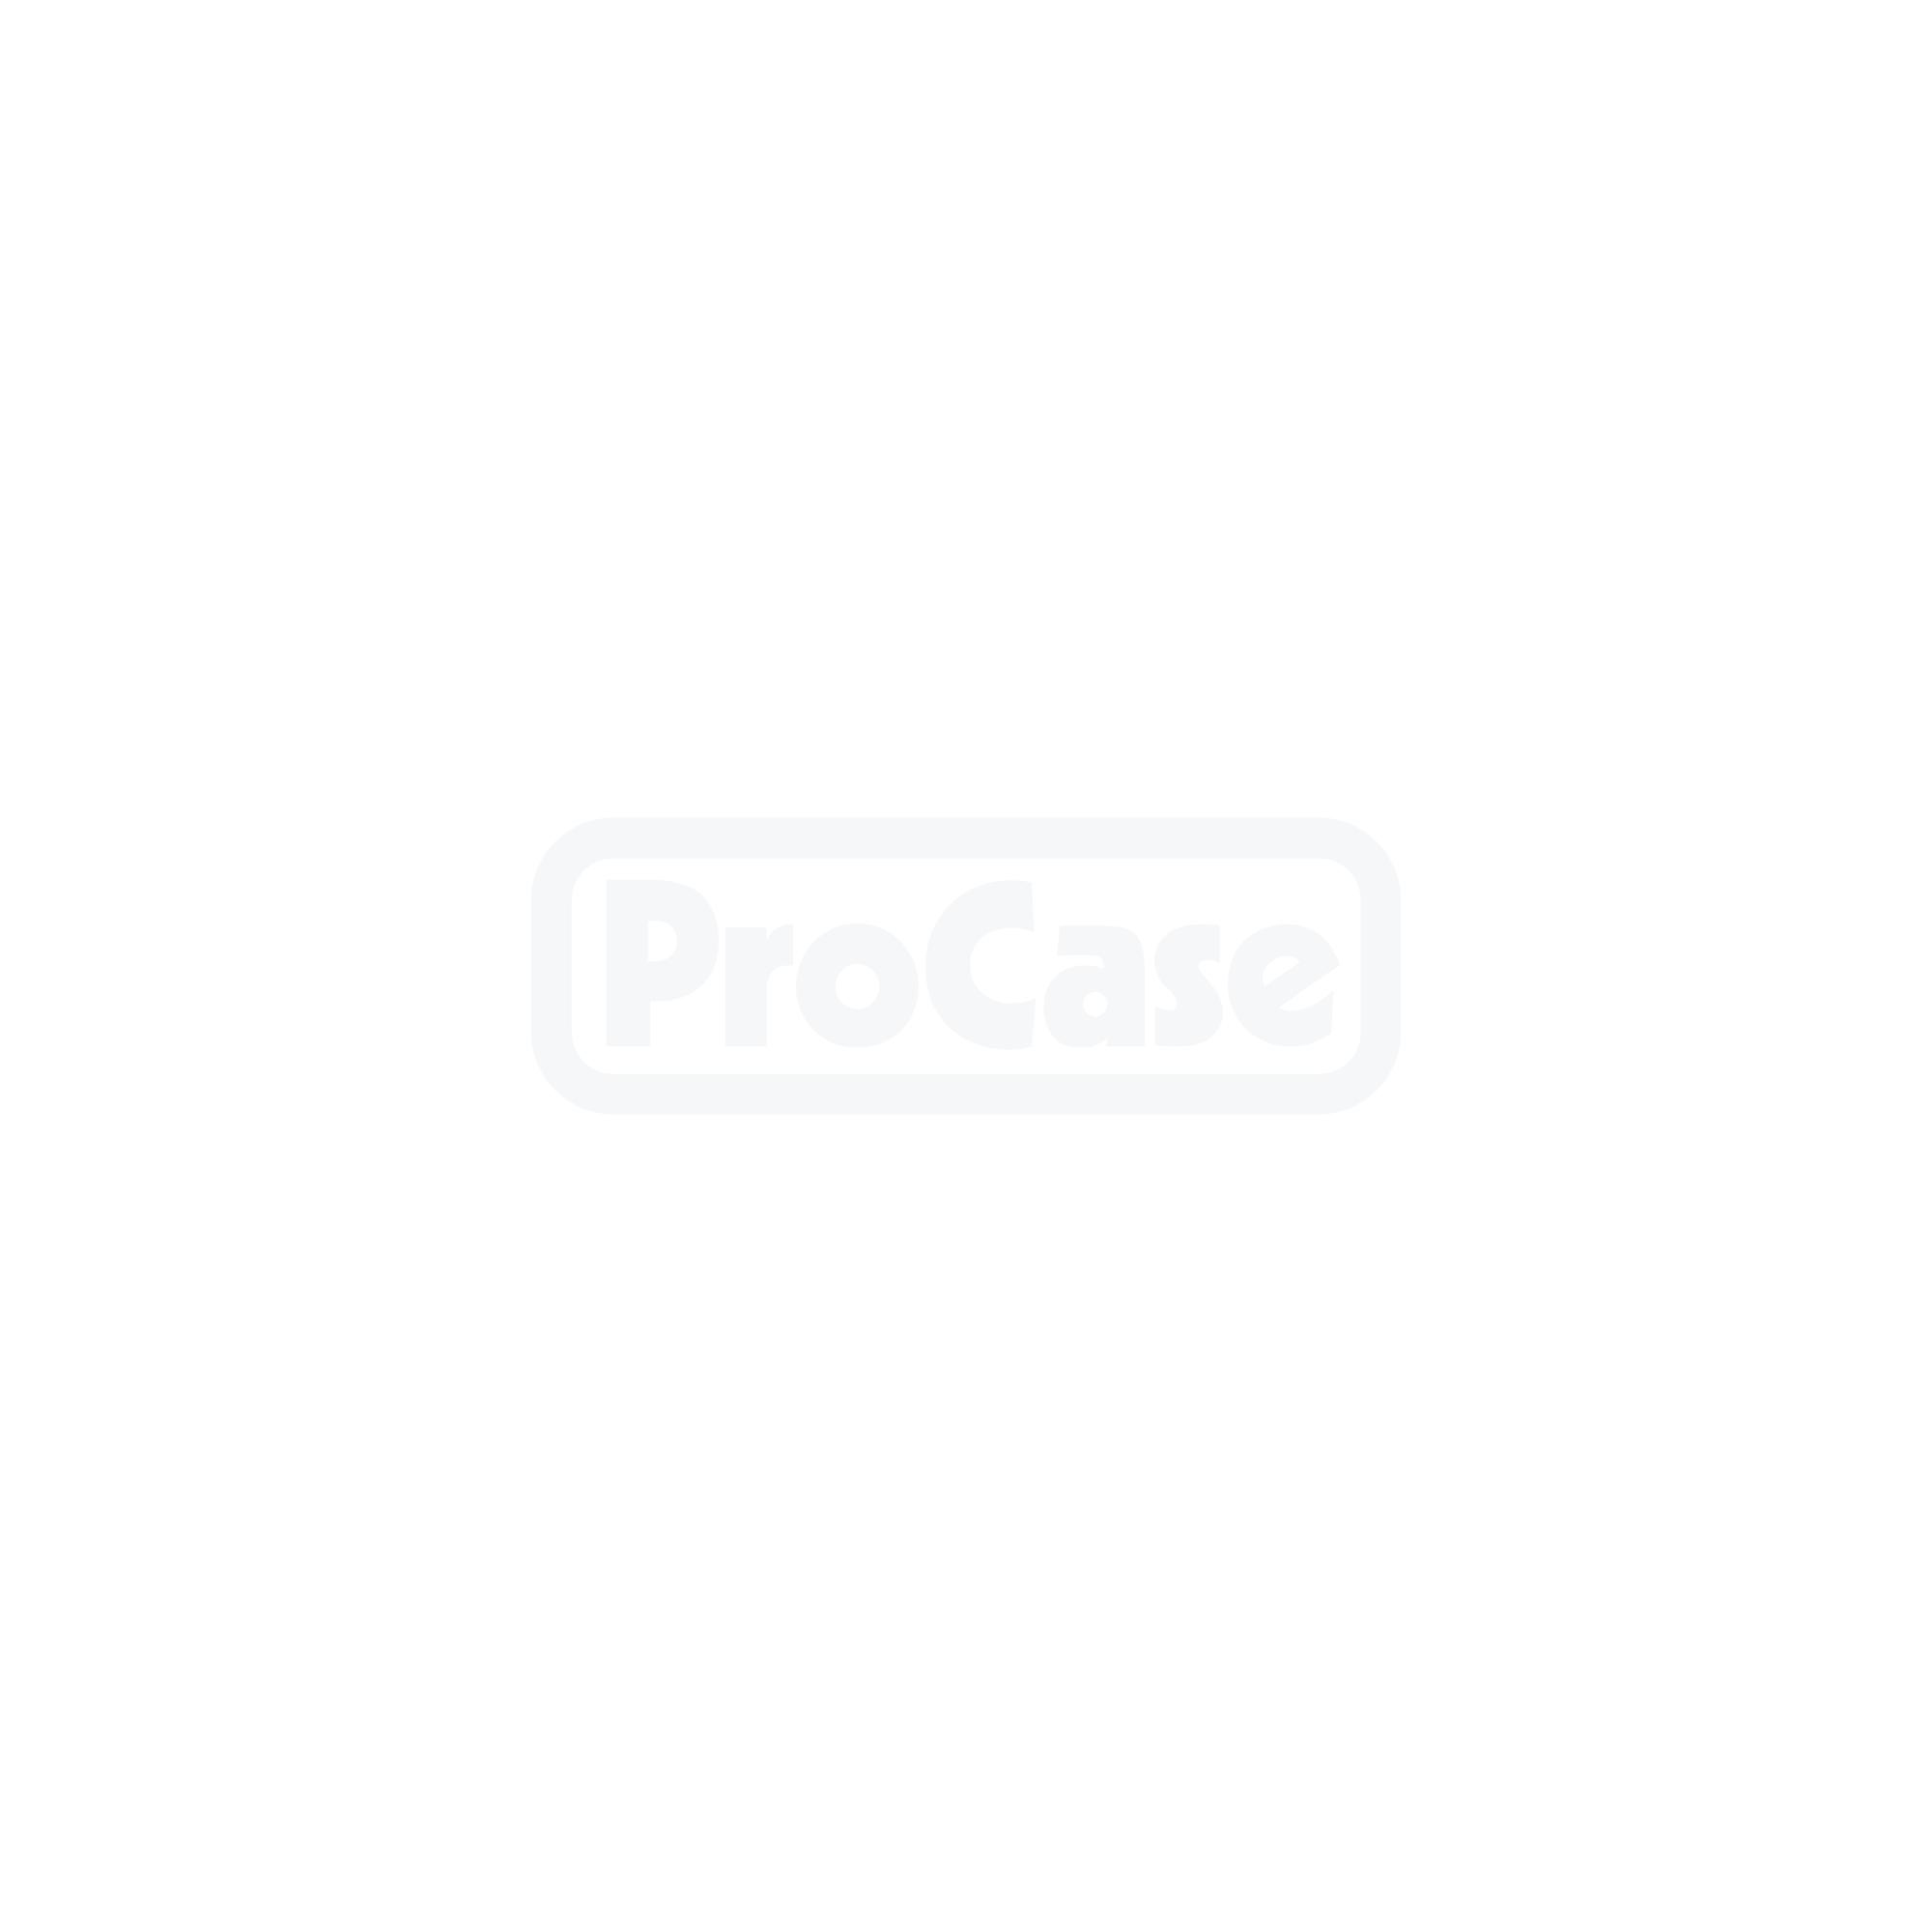 Flipcase für Yamaha Rivage PM10 CS-R10-S